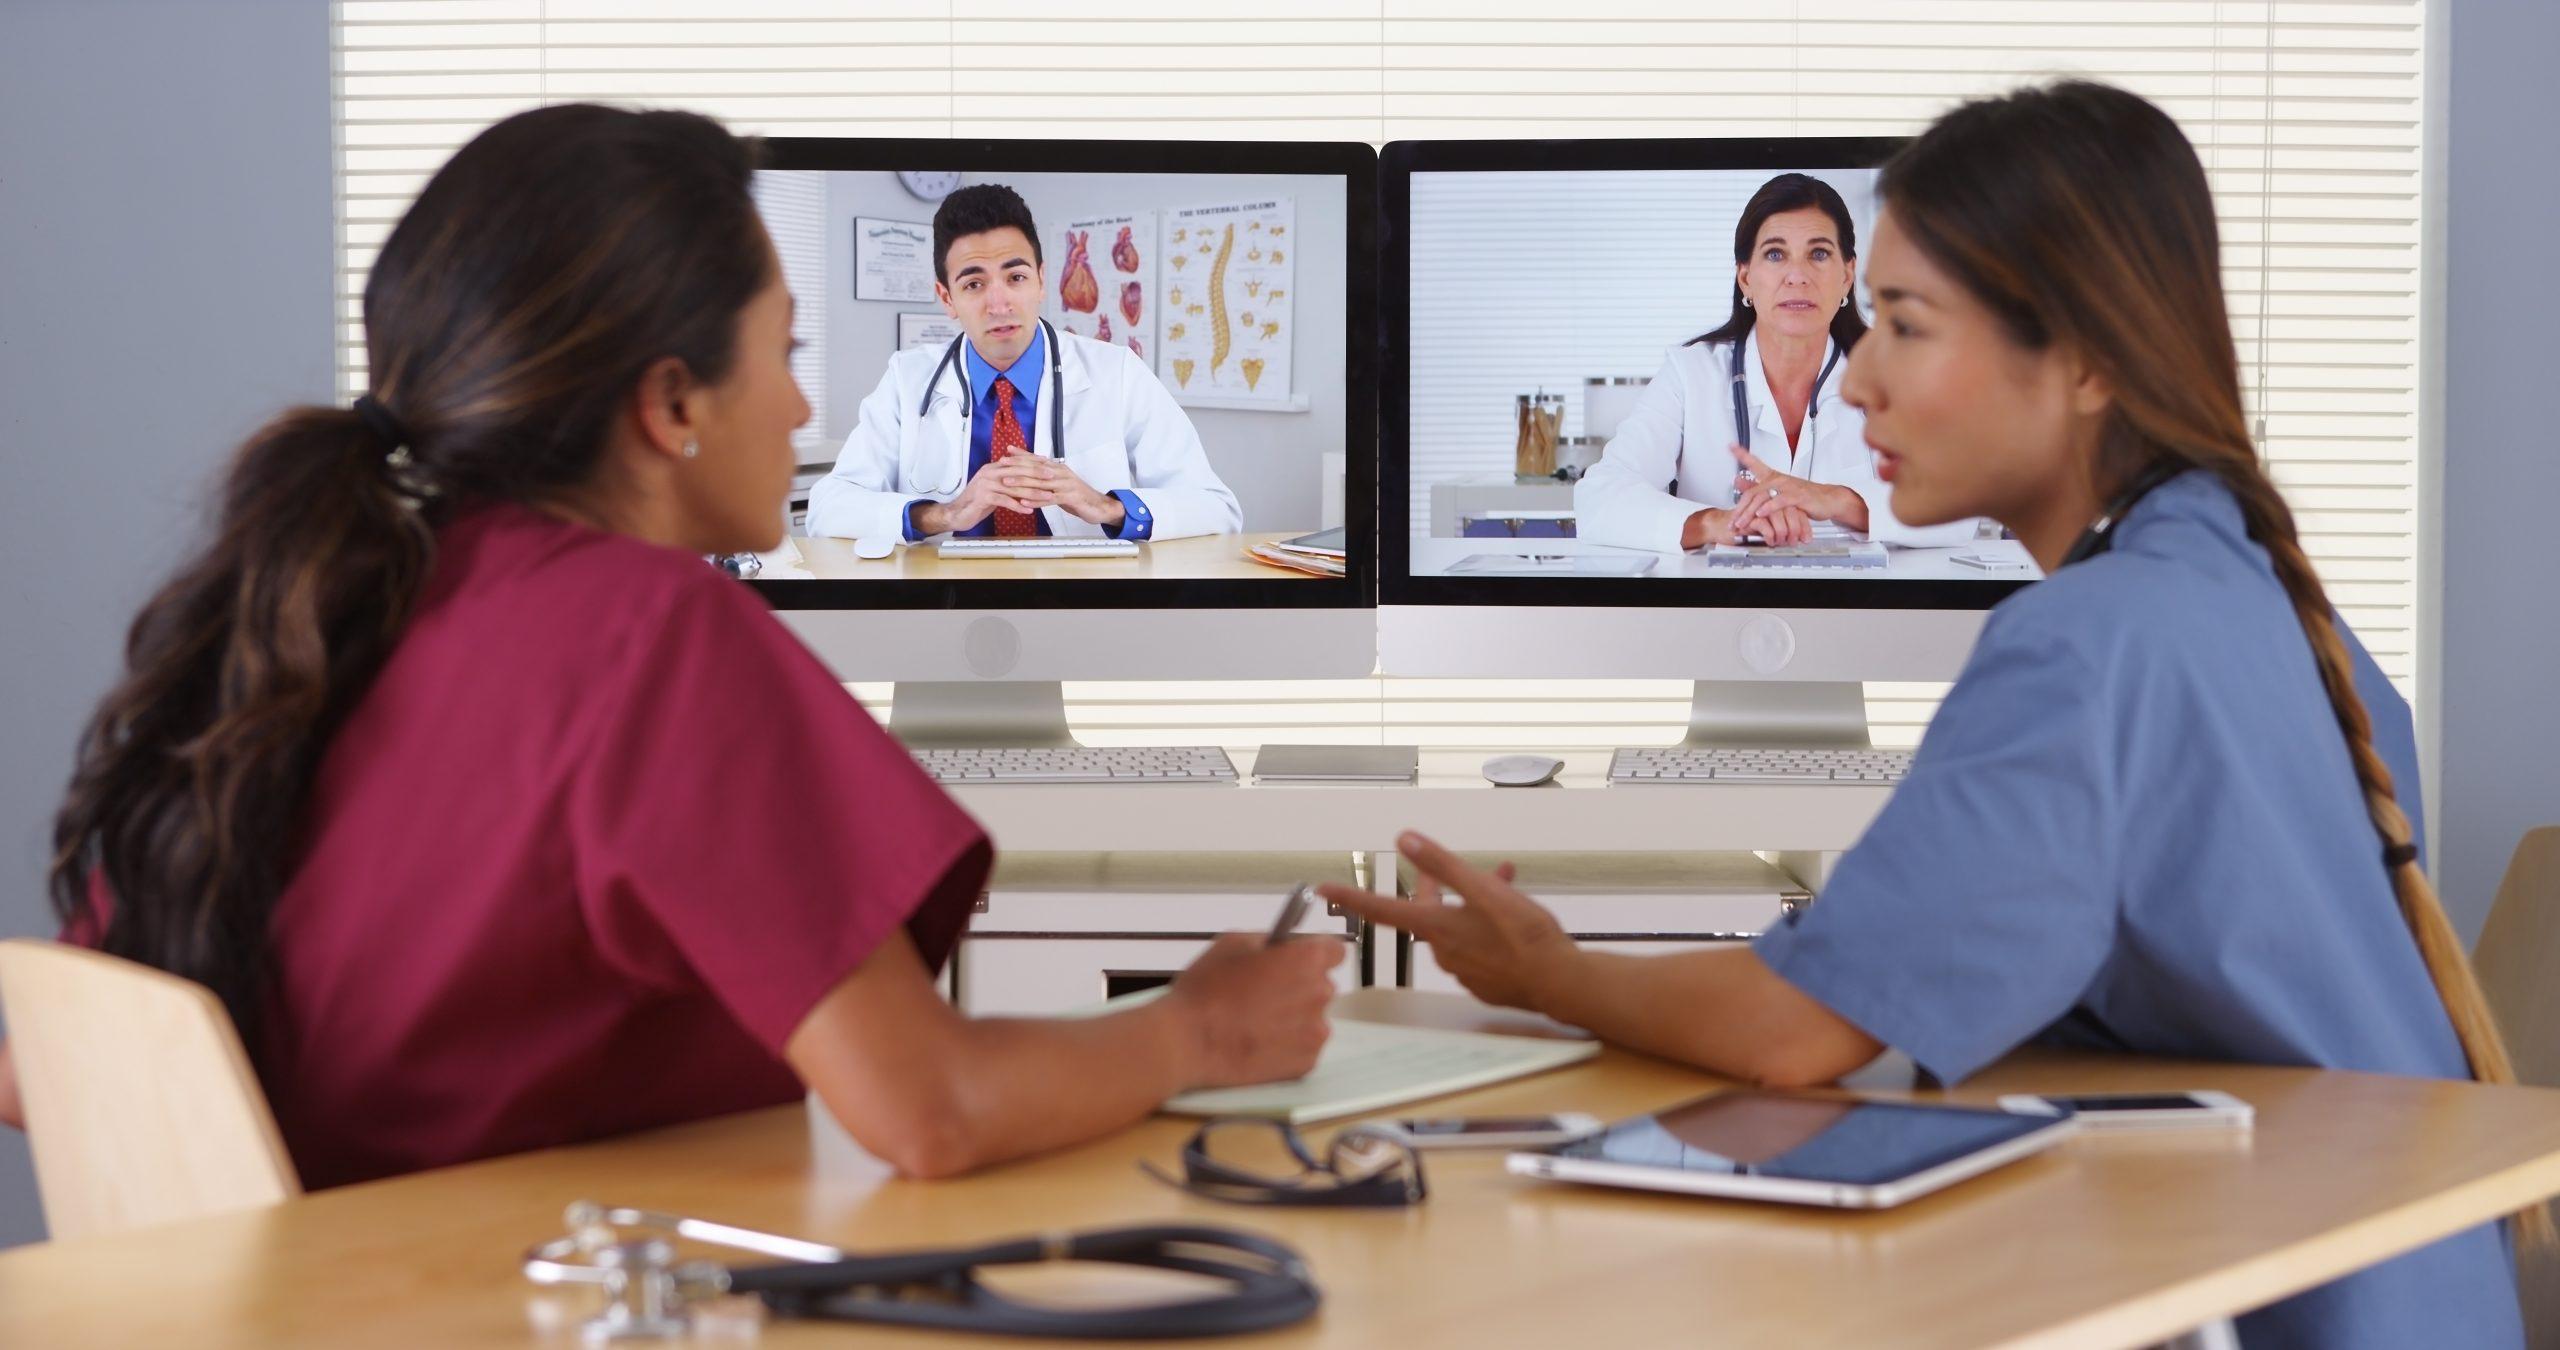 Doctor and nurse virtual call